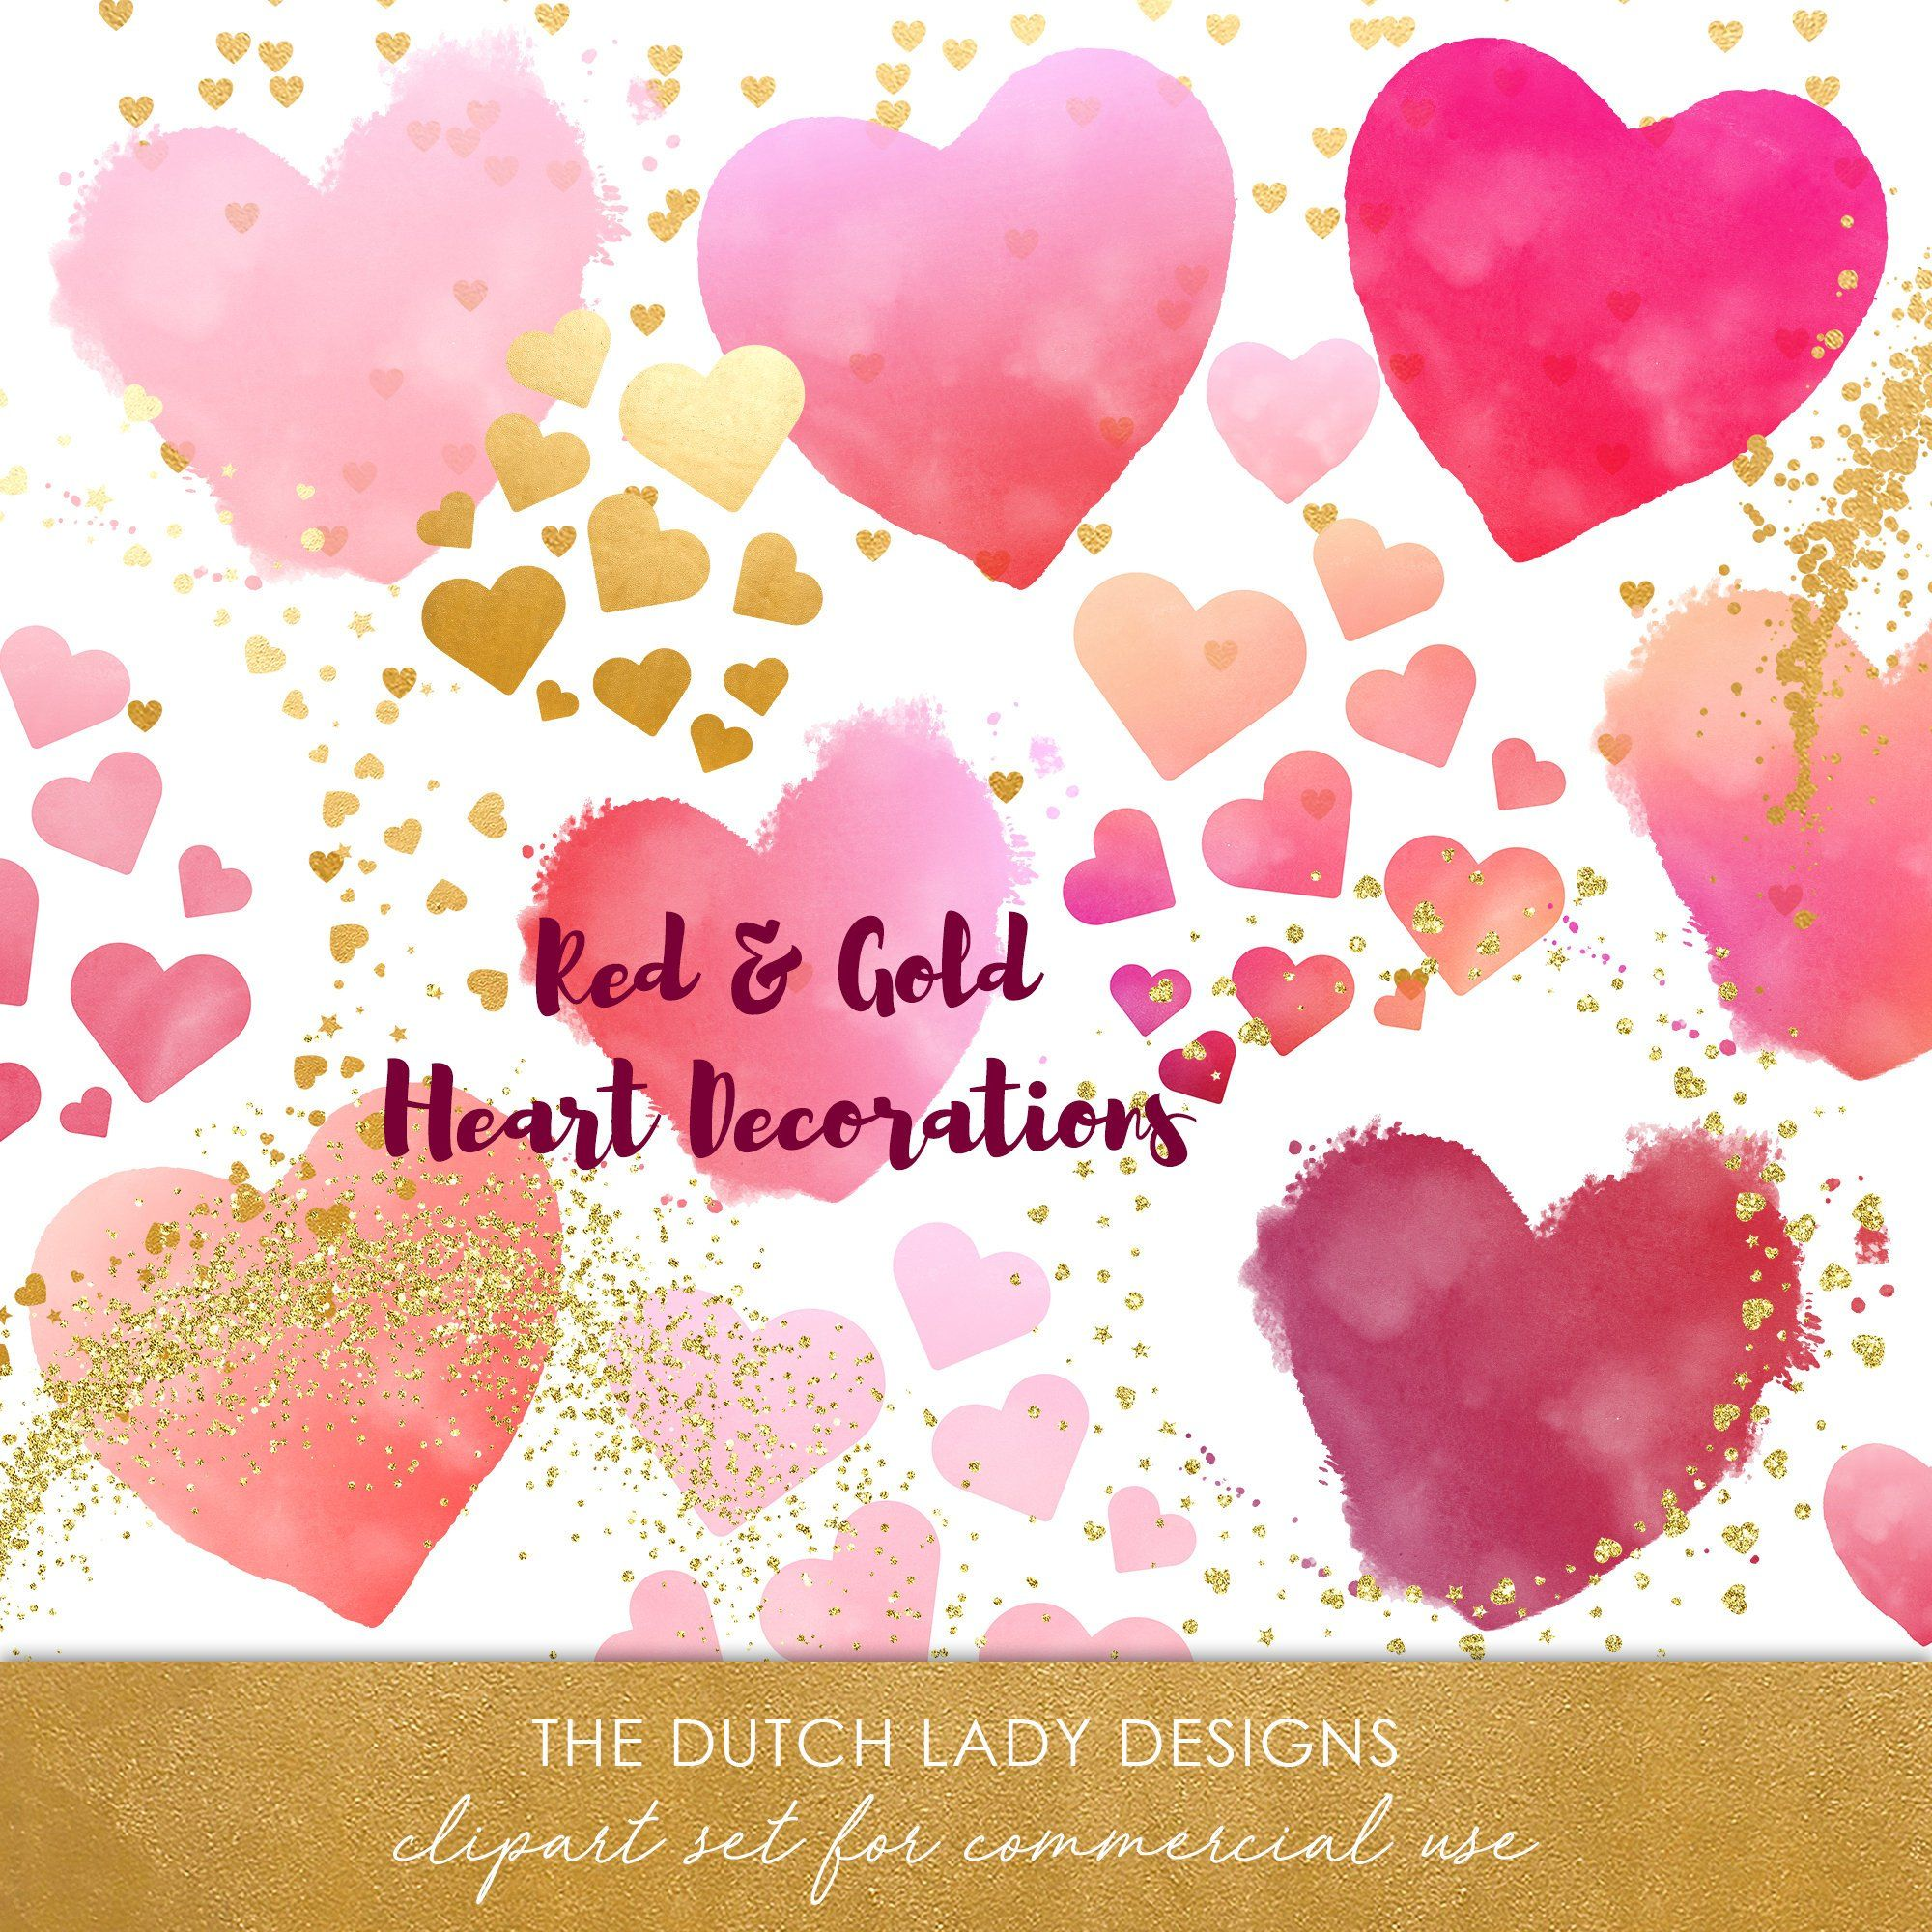 hight resolution of heart clipart valentine clipart love clipart wedding clipart playful hearts watercolor hearts golden decoration digital decoration golden sprinkles